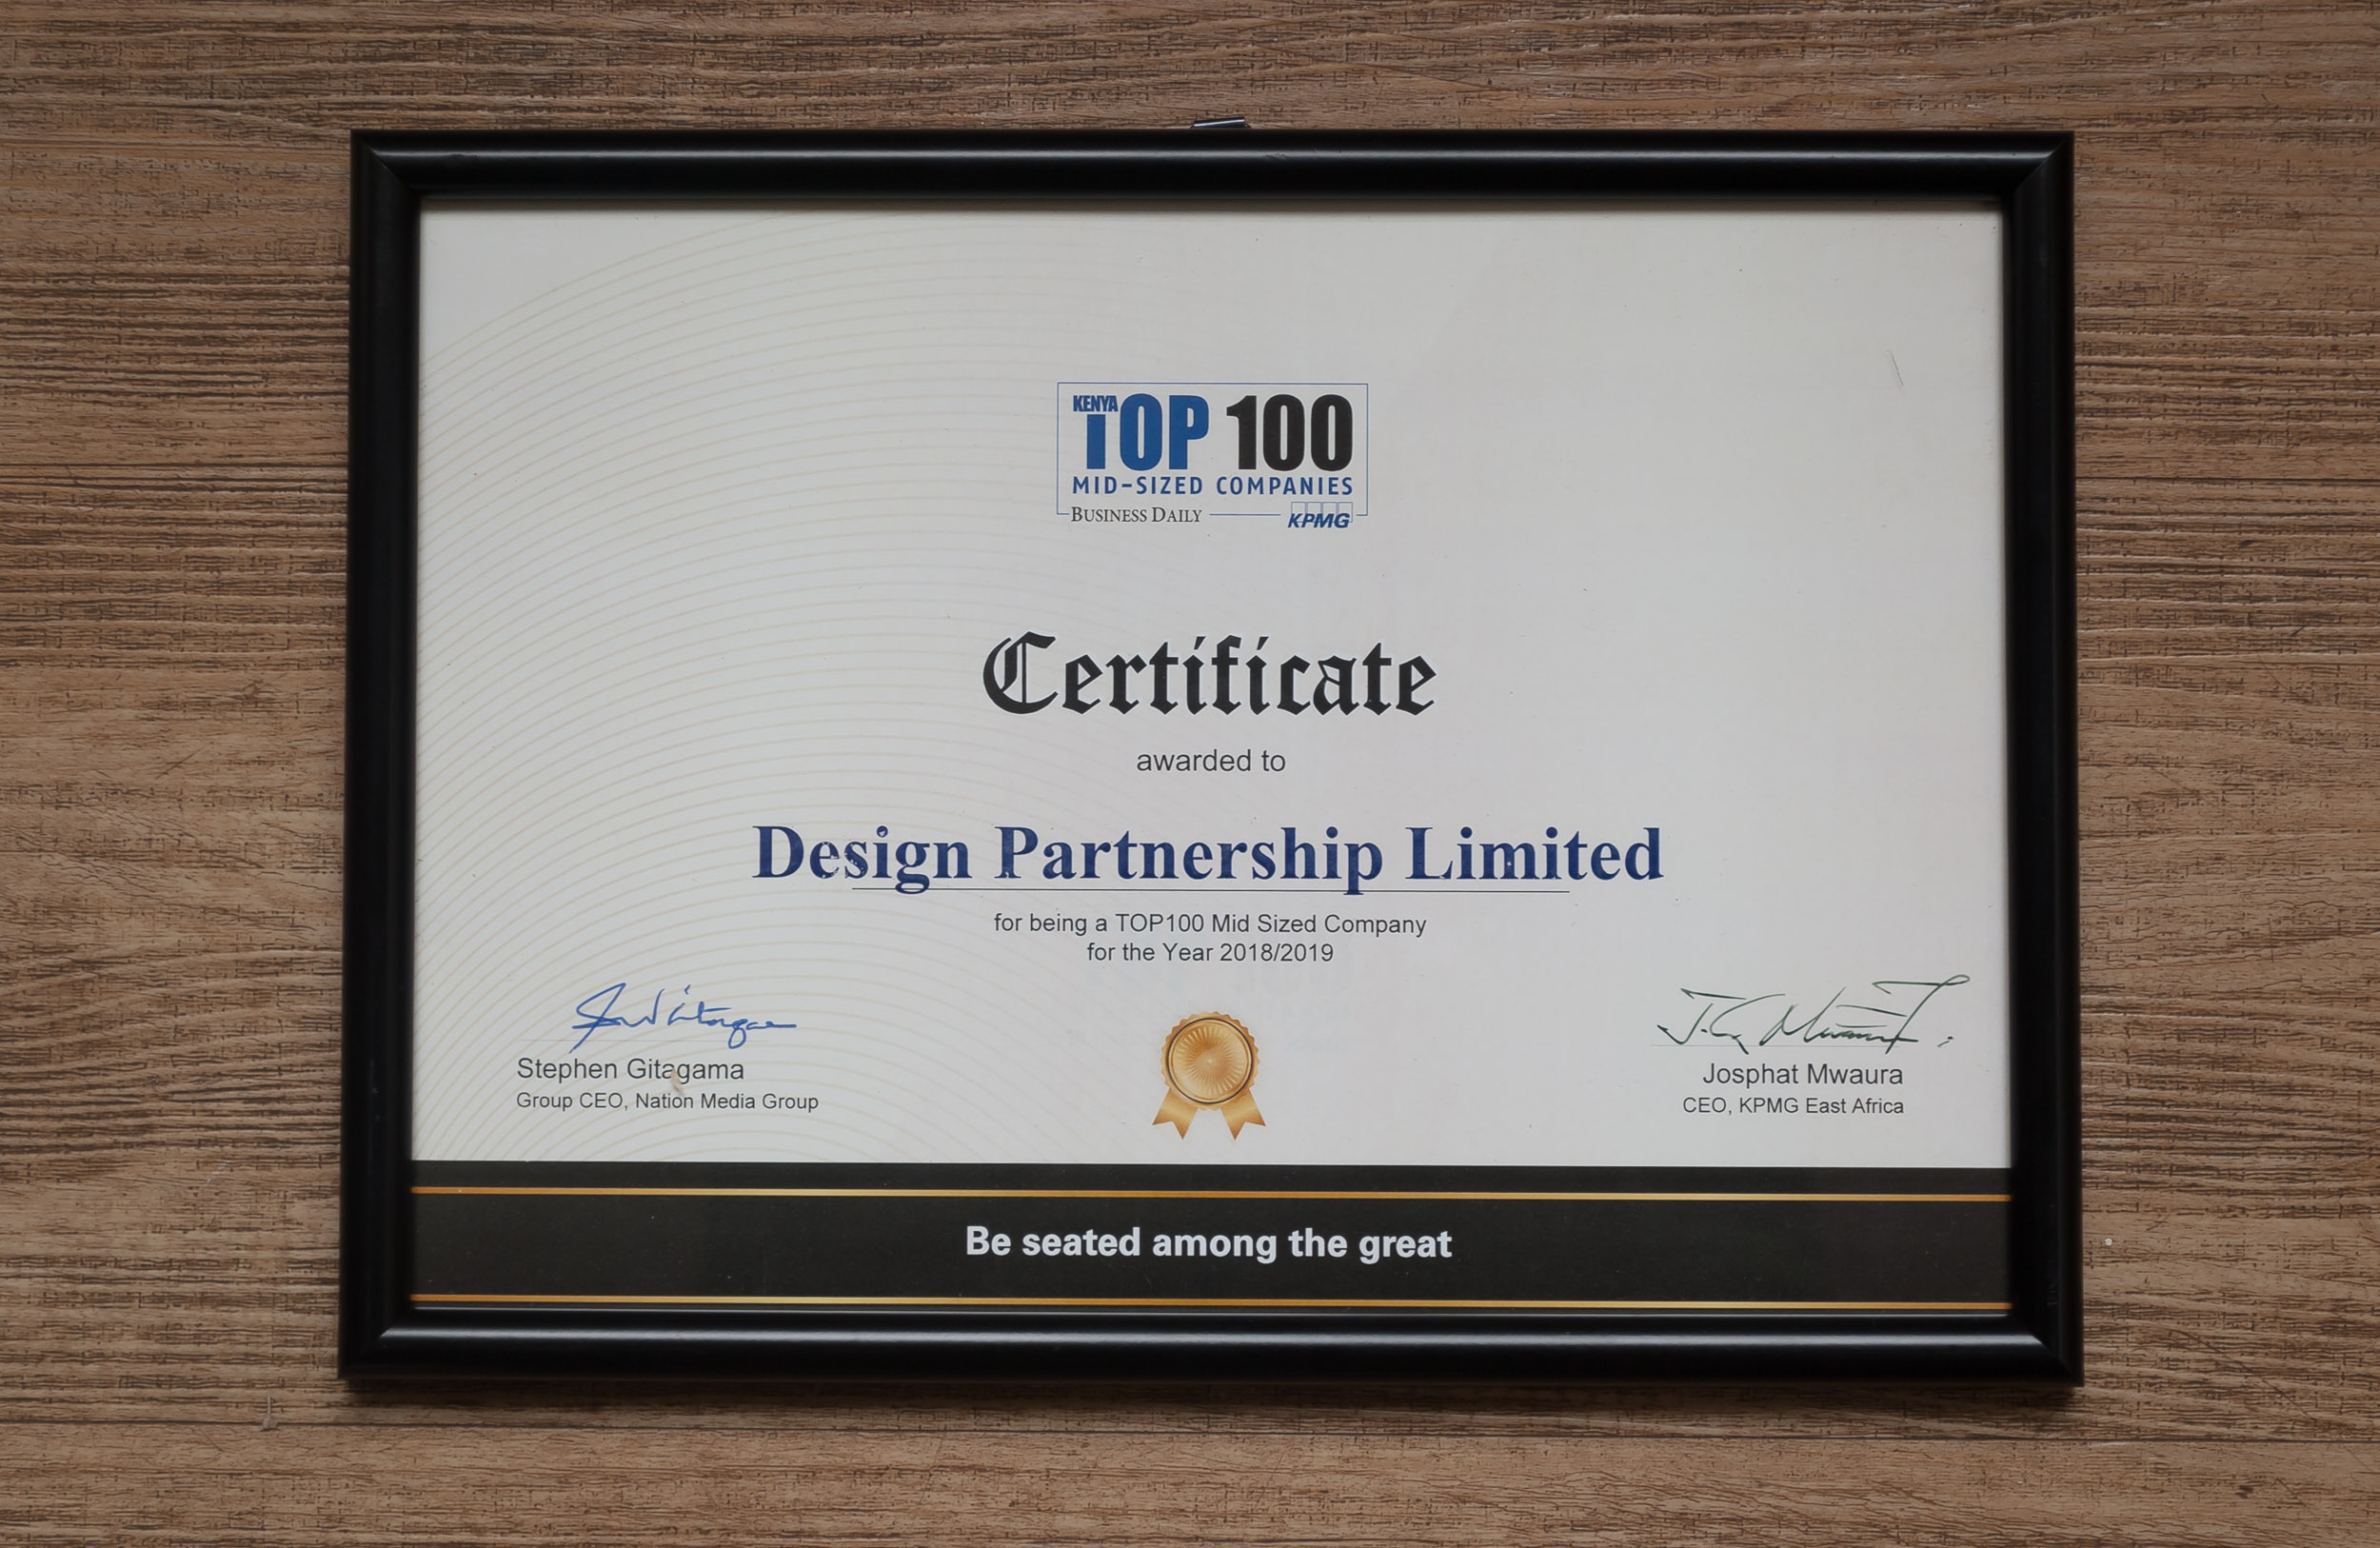 Top 100 Mid-Sized Companies in Kenya 2018/2019 Certificate